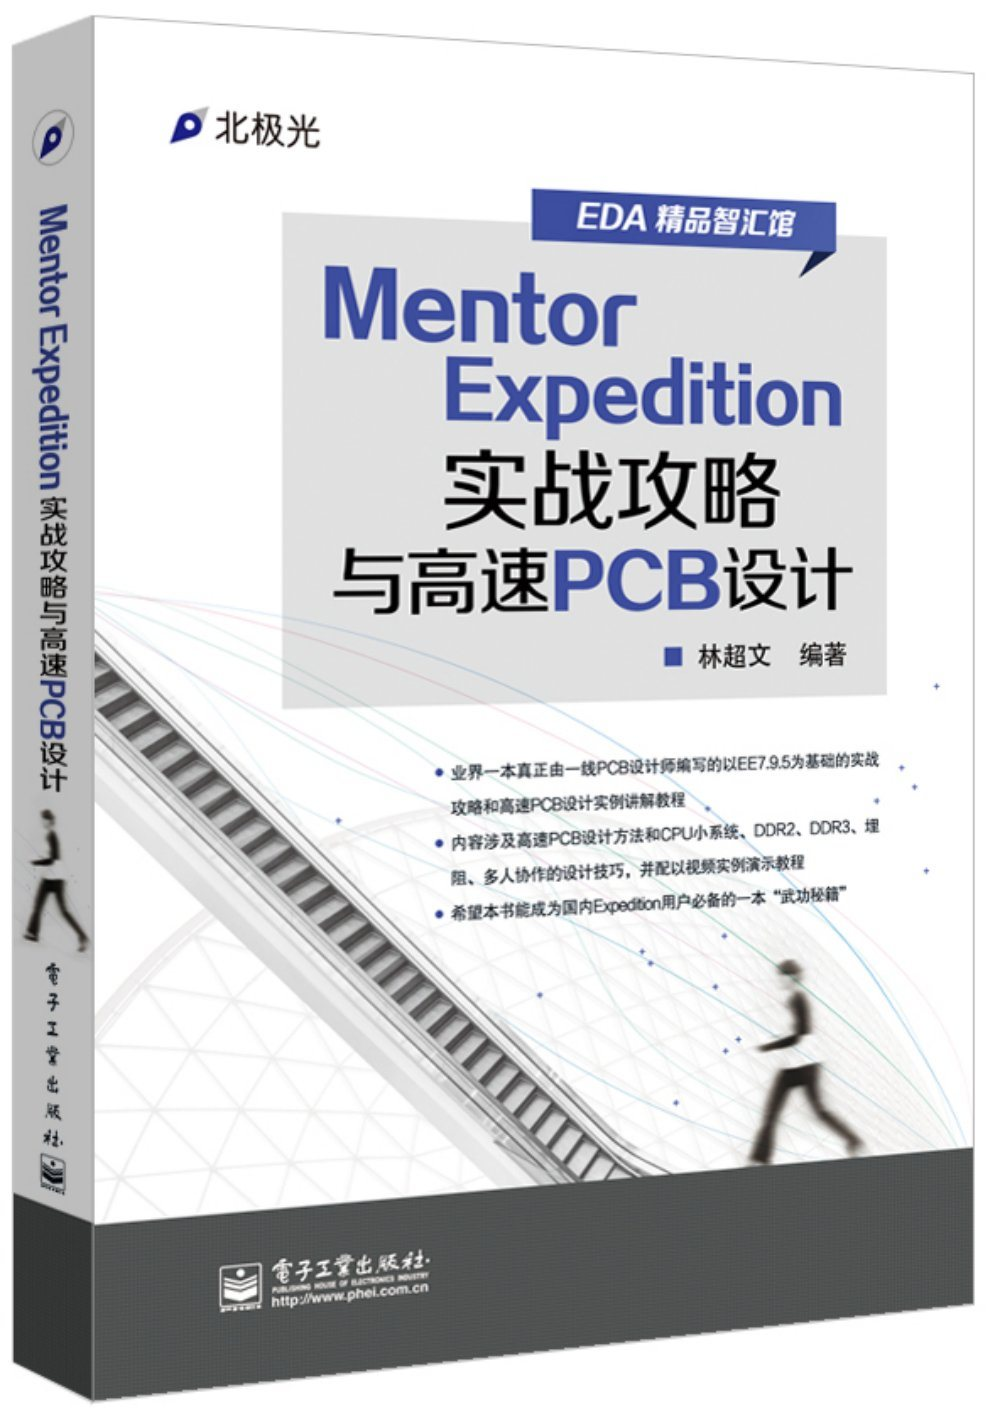 Mentor Expedition實戰攻略與高速PCB